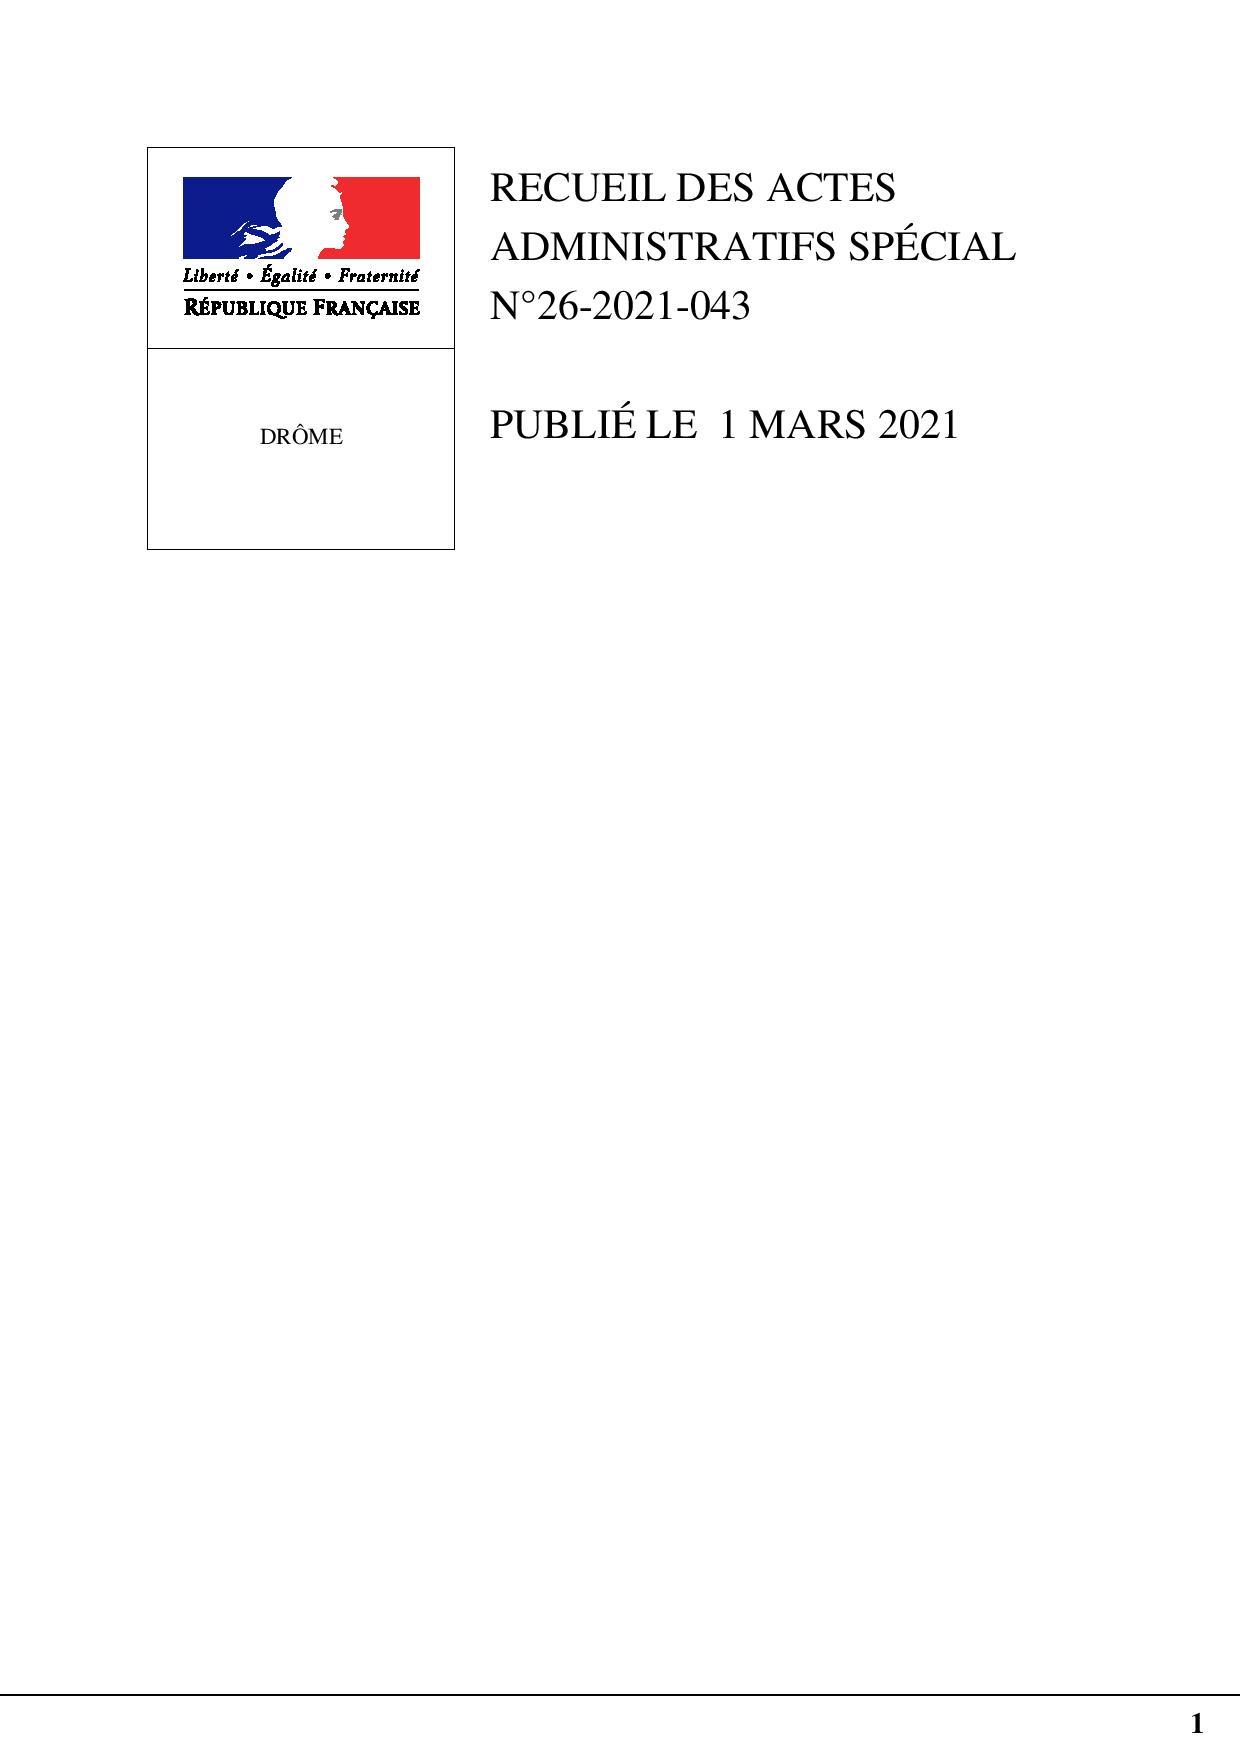 recueil-26-2021-043-recueil-des-actes-administratifs-special_1_-2-page-001.jpg